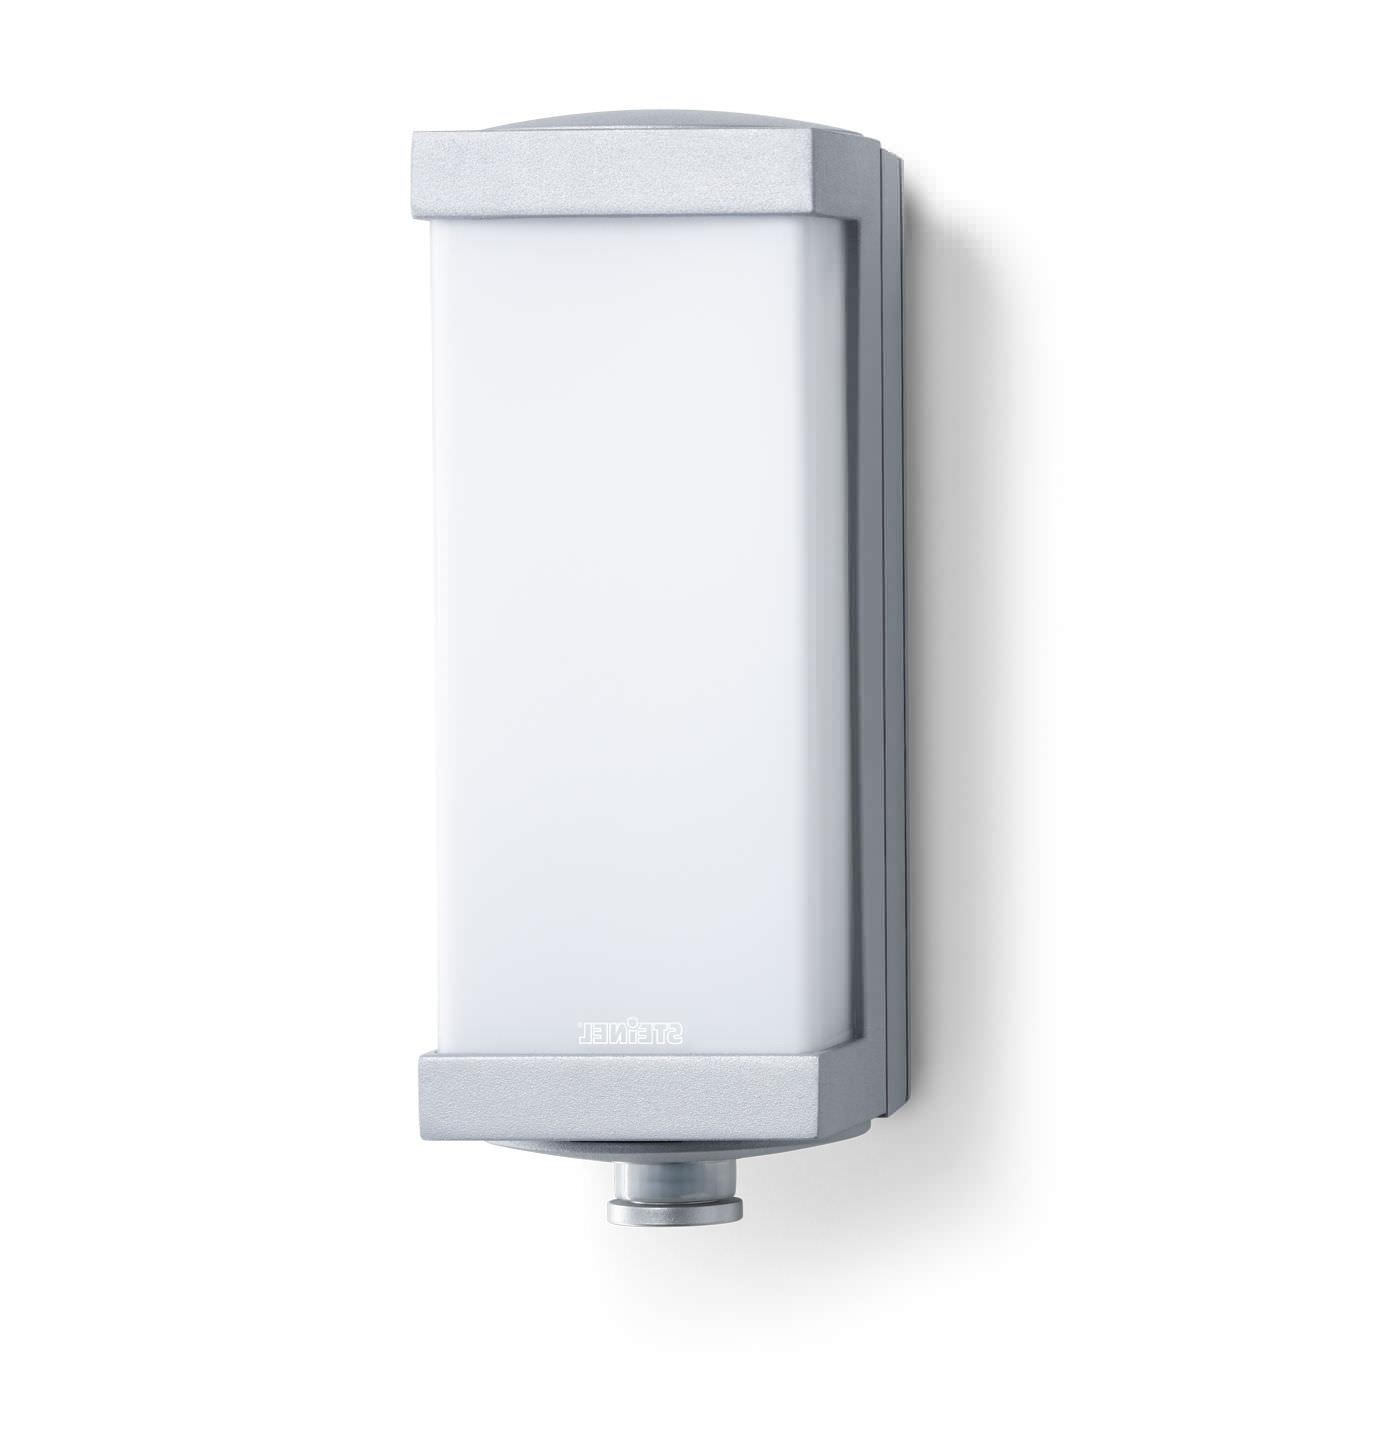 Outdoor Led Wall Lights With Sensor • Led Lights Design In 2018 Outdoor Led Wall Lights With Sensor (View 7 of 20)